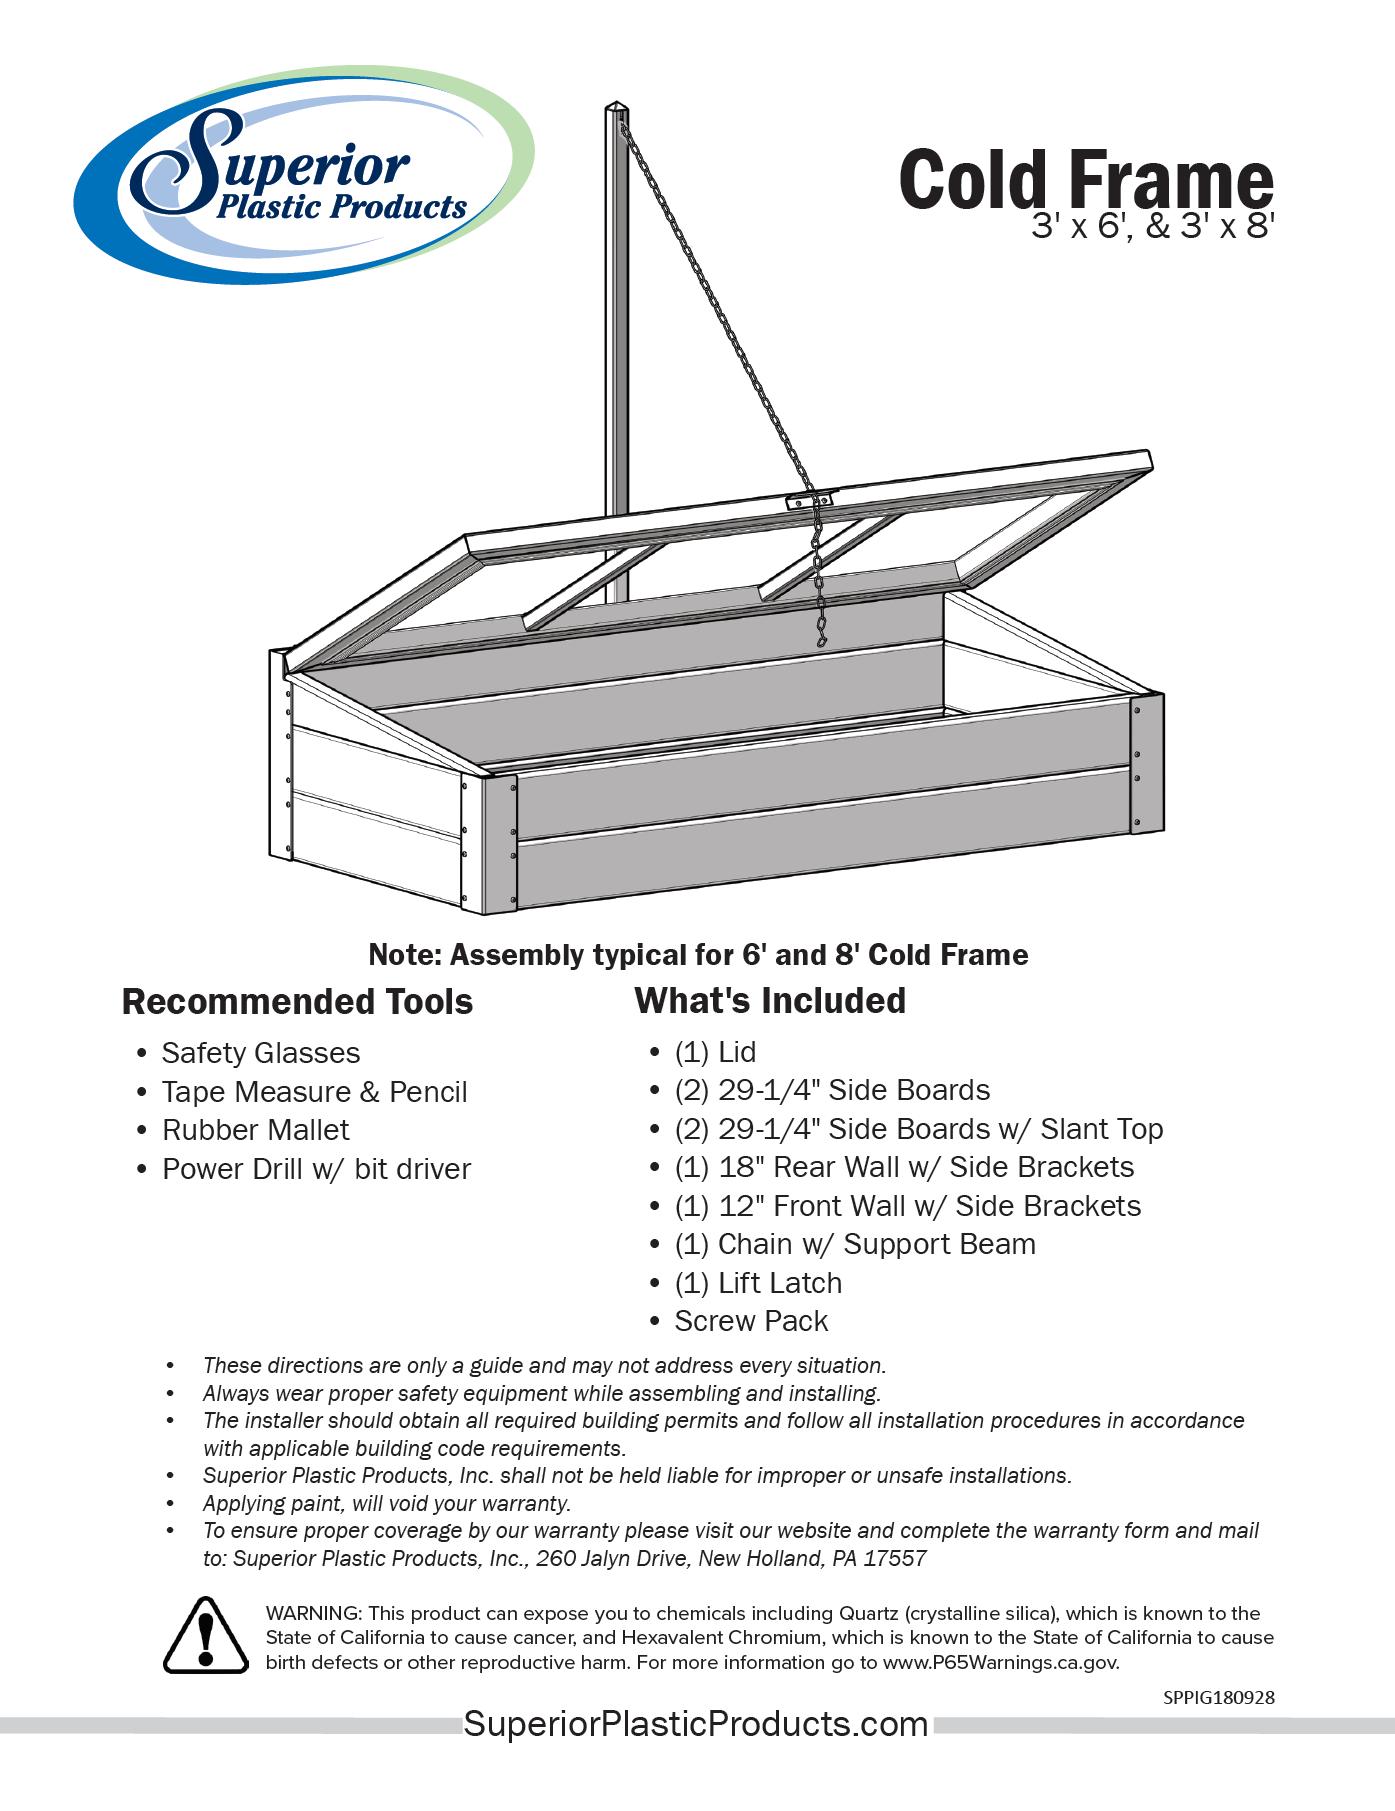 Low-Maintenance Vinyl Cold Frames - Superior Plastic Products